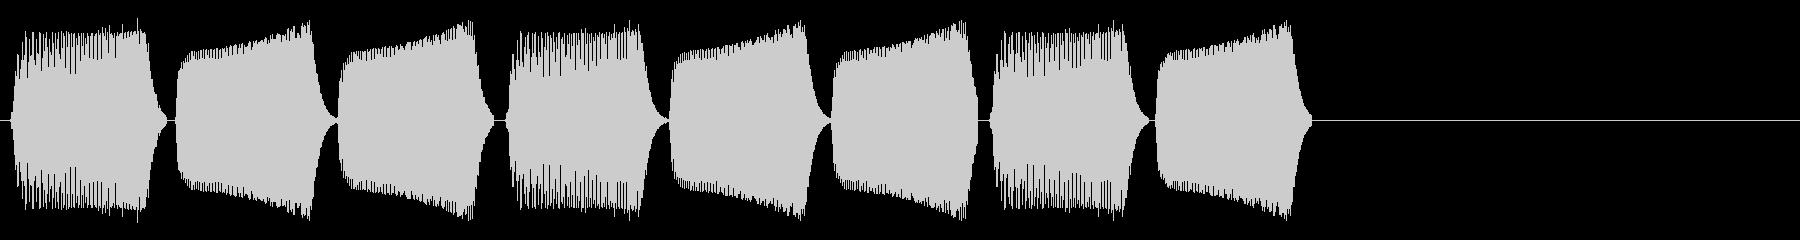 KANTブパ自主規制音2shortの未再生の波形